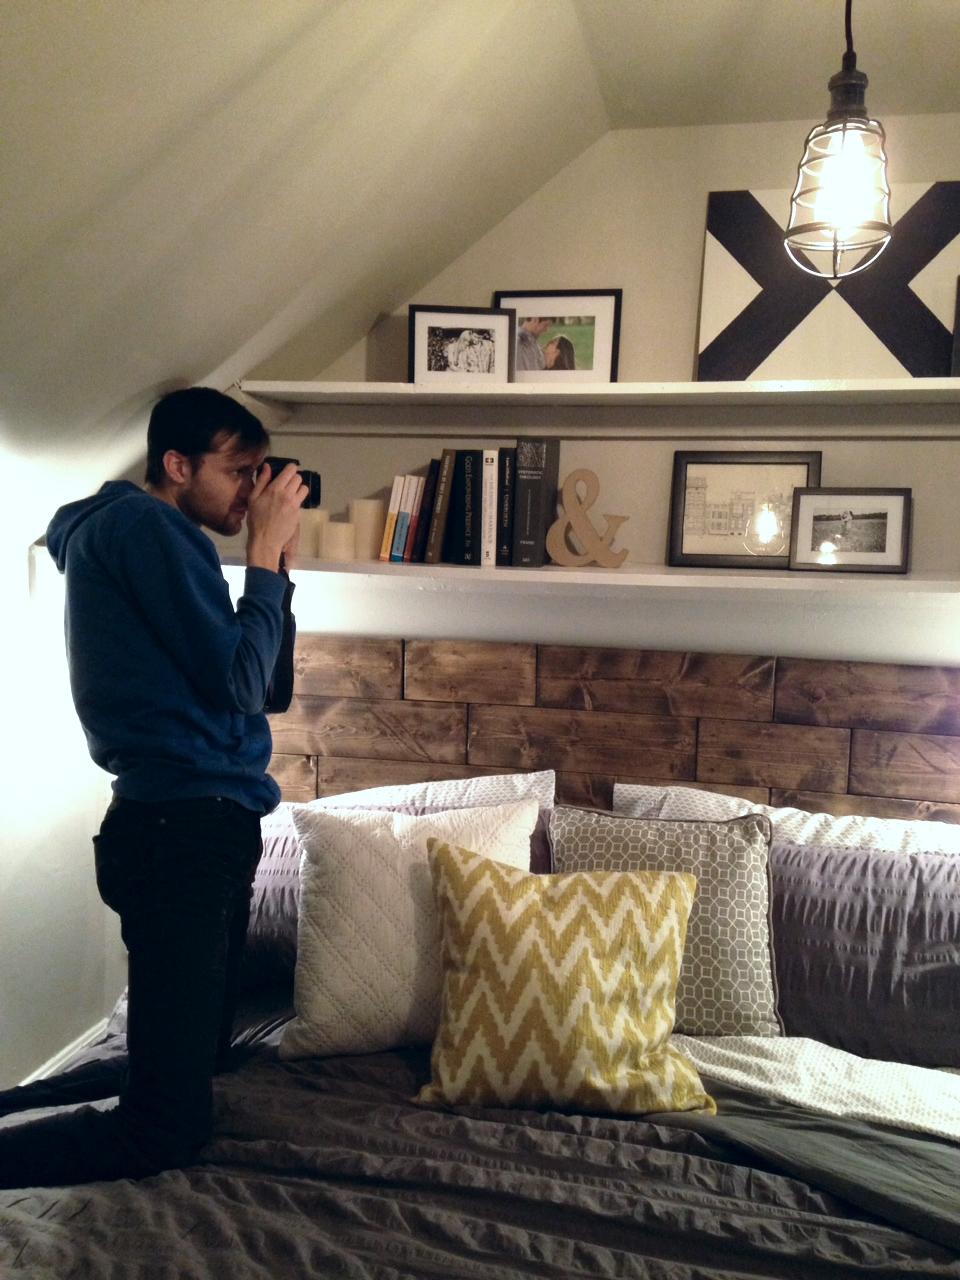 Photographing something photographing something...